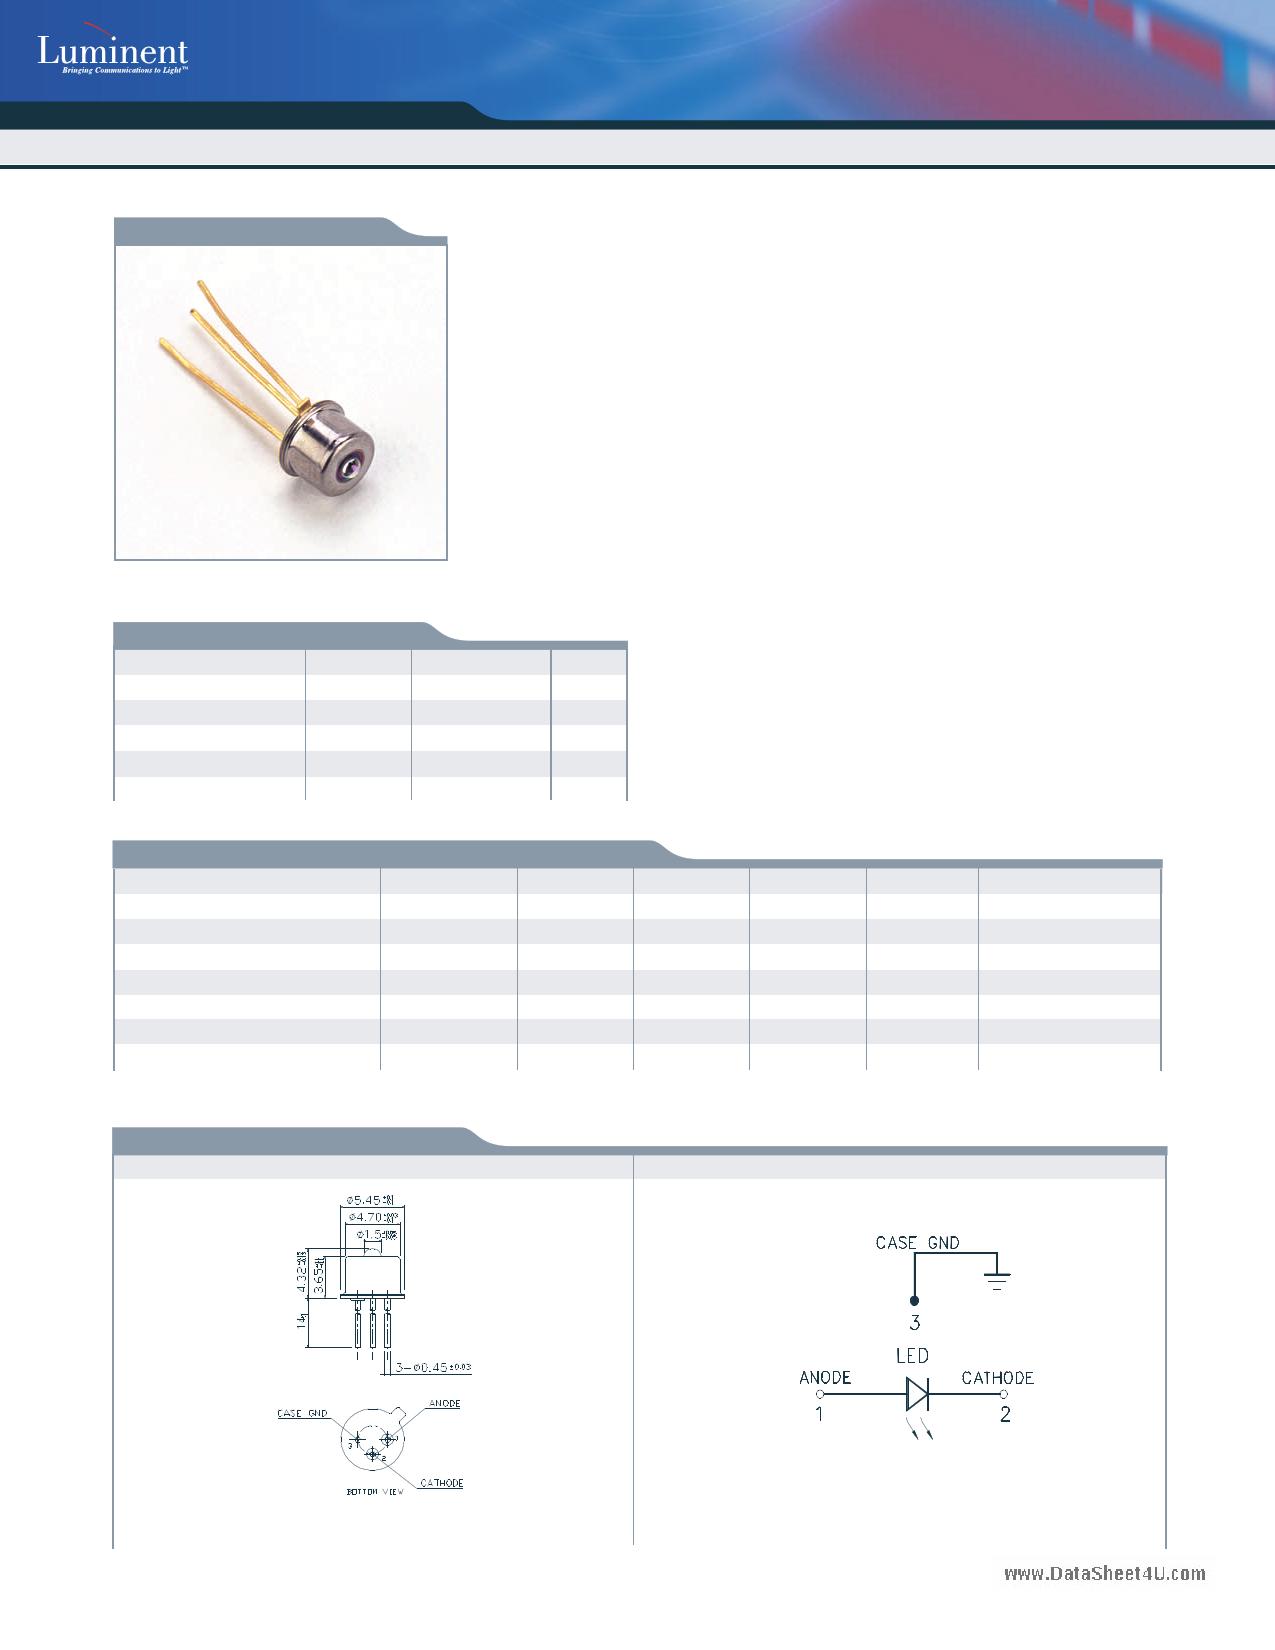 L-13-155-G-B datasheet